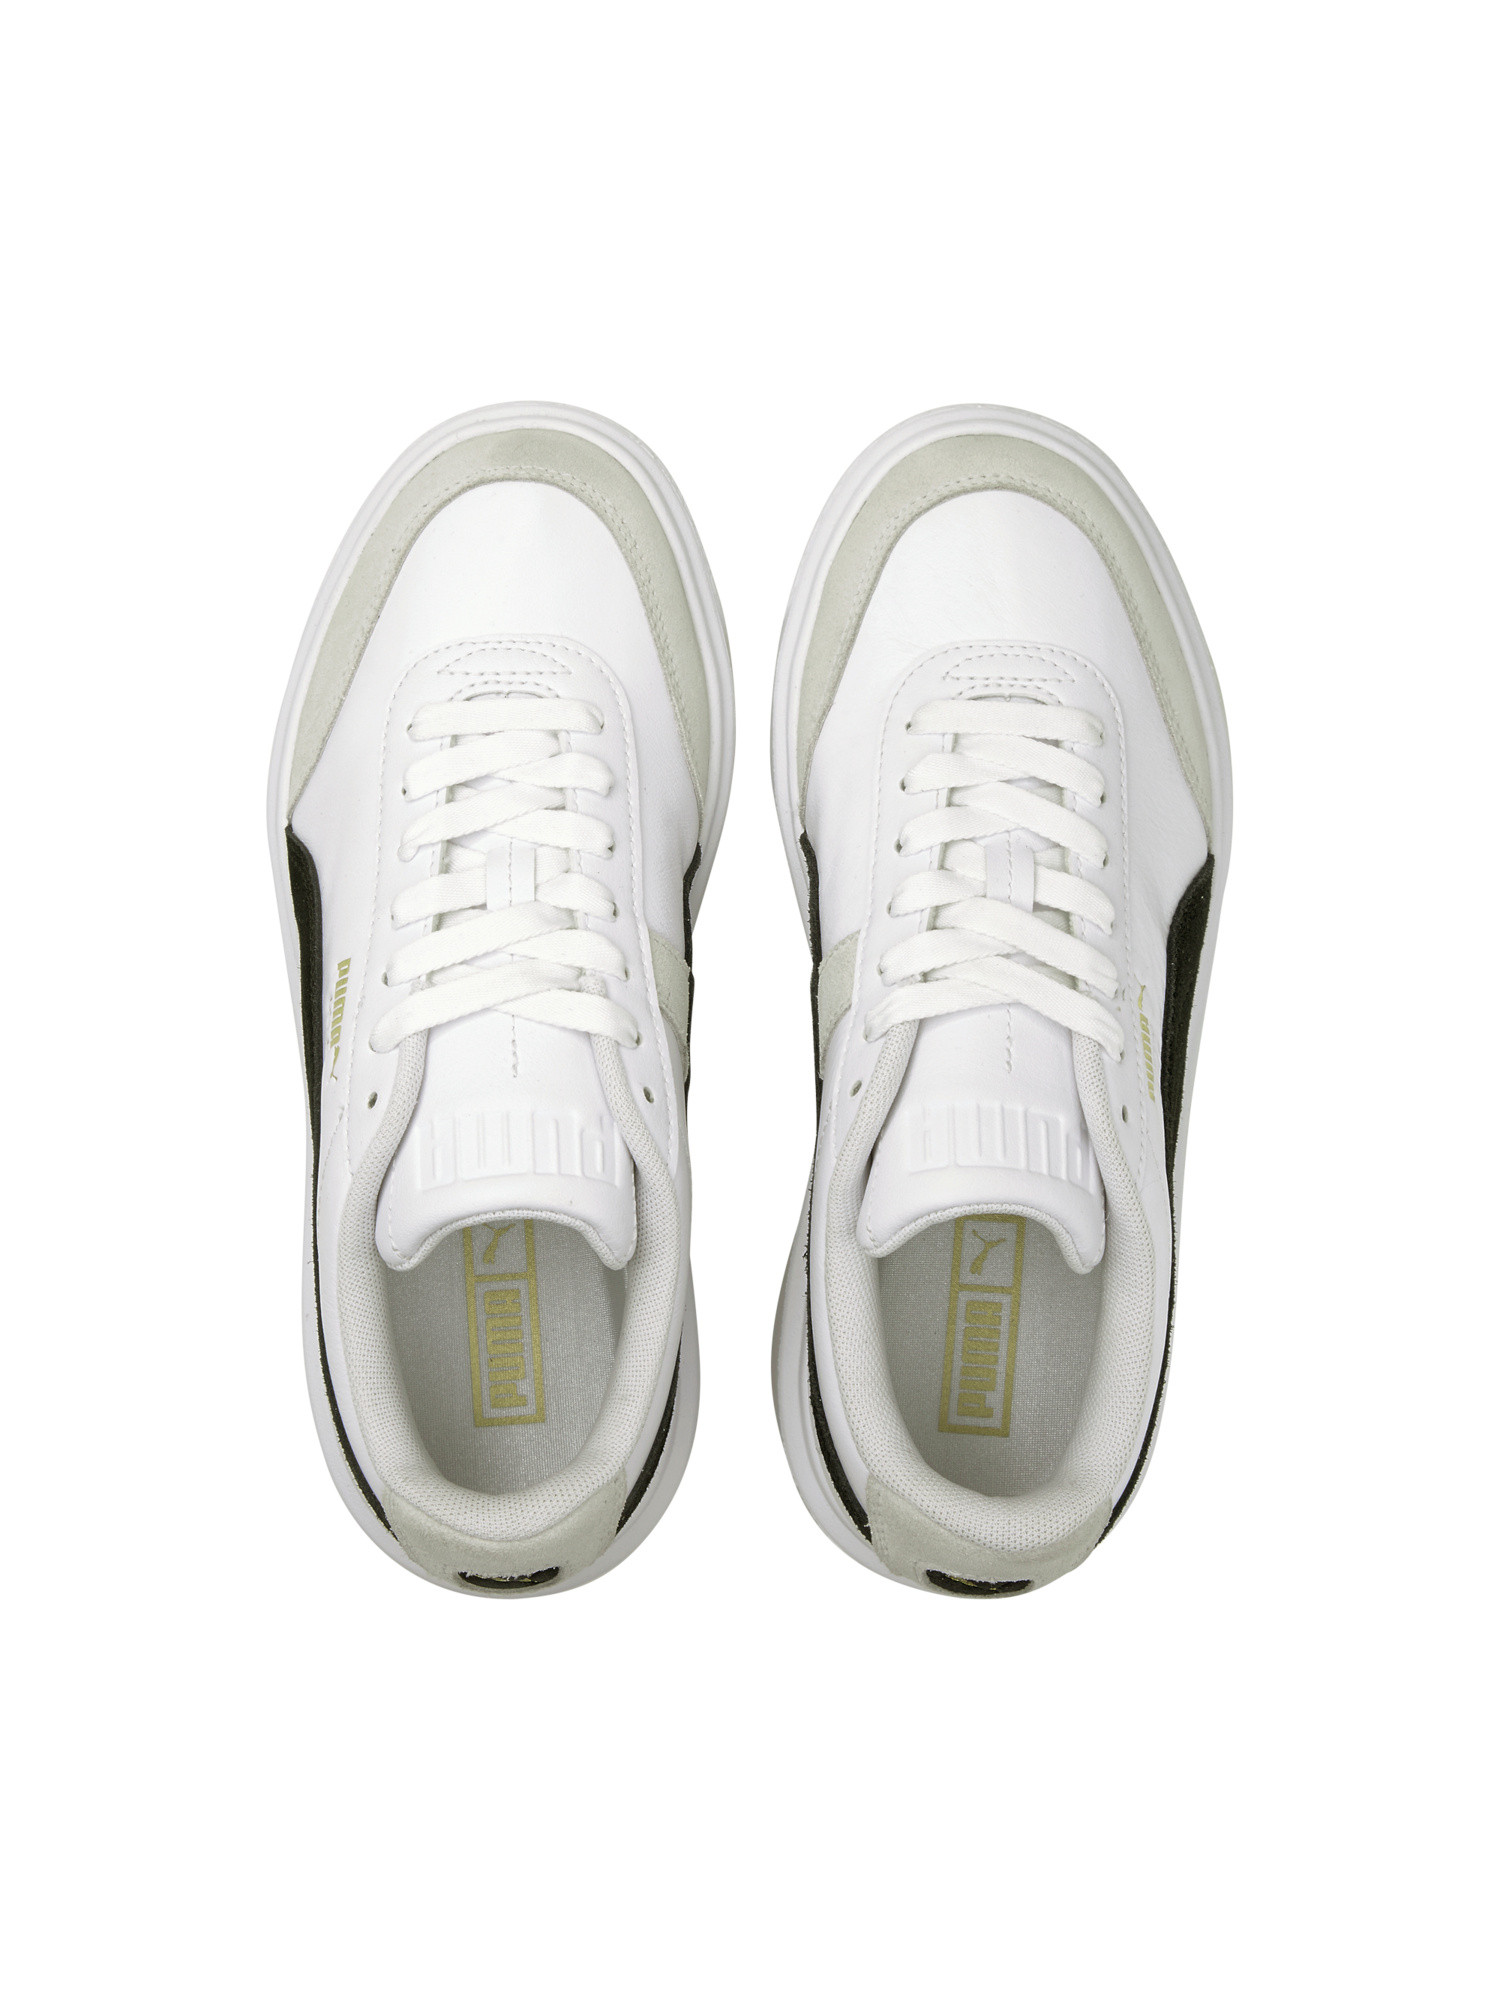 Sneakers Oslo Maya, Nero/Bianco, large image number 3